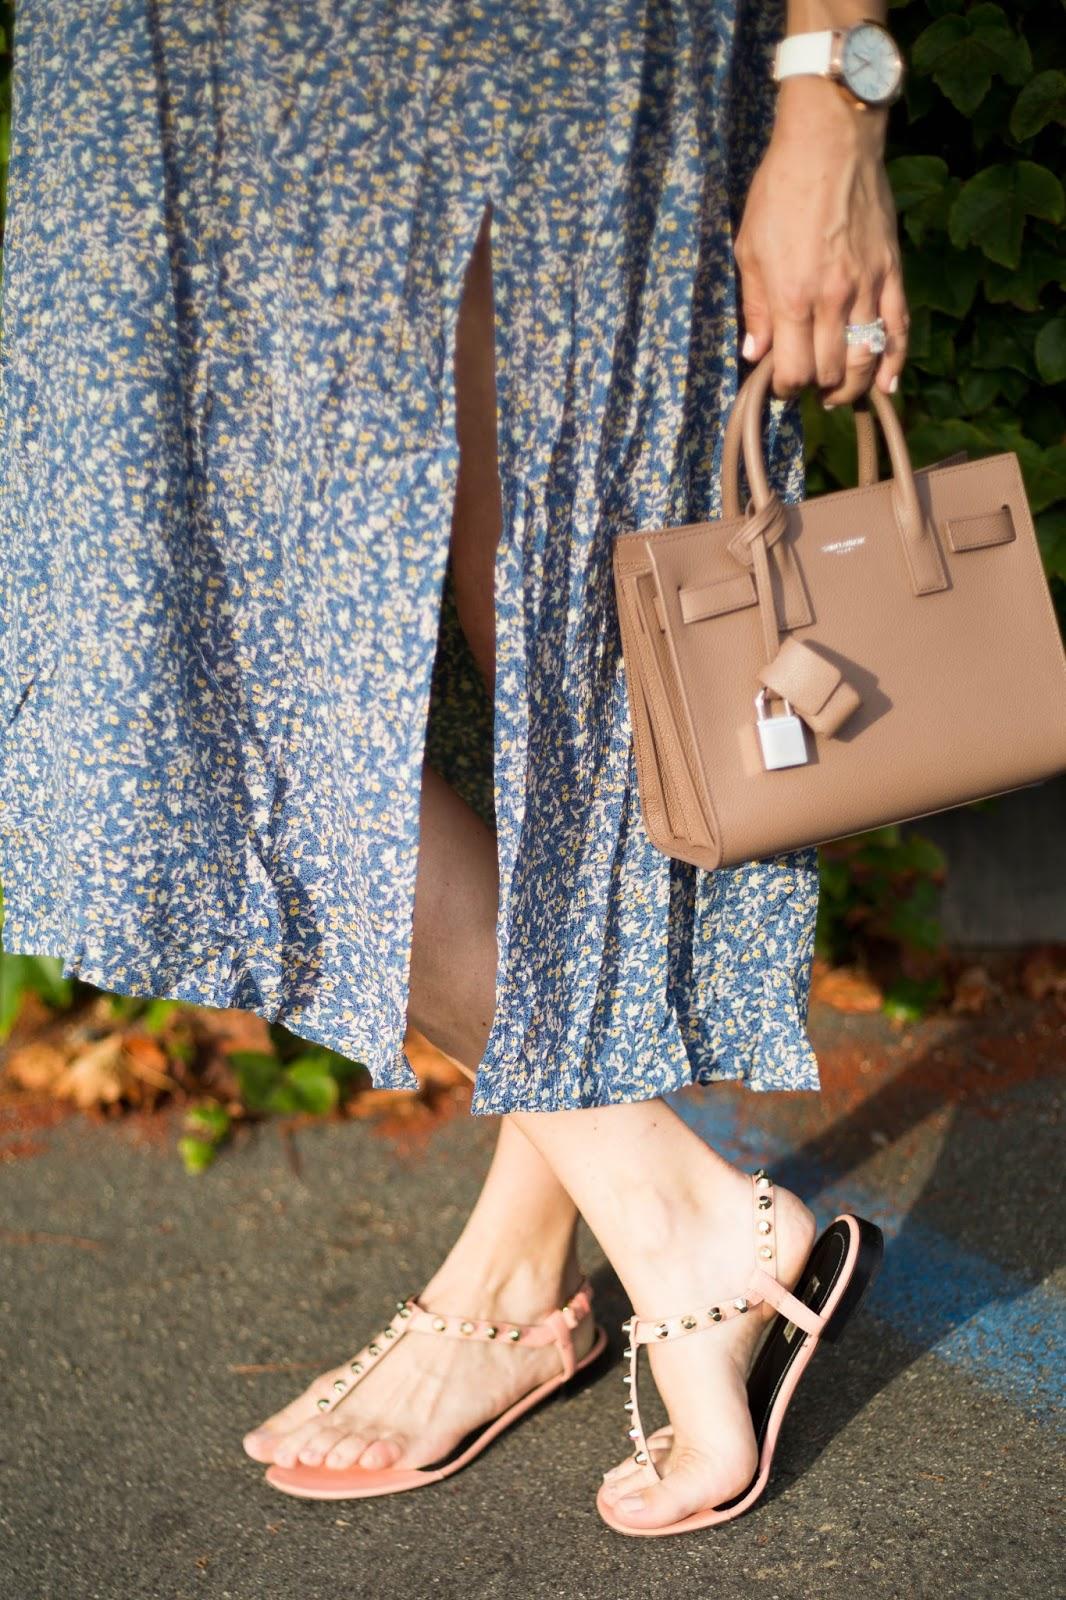 blush saint laurent bag